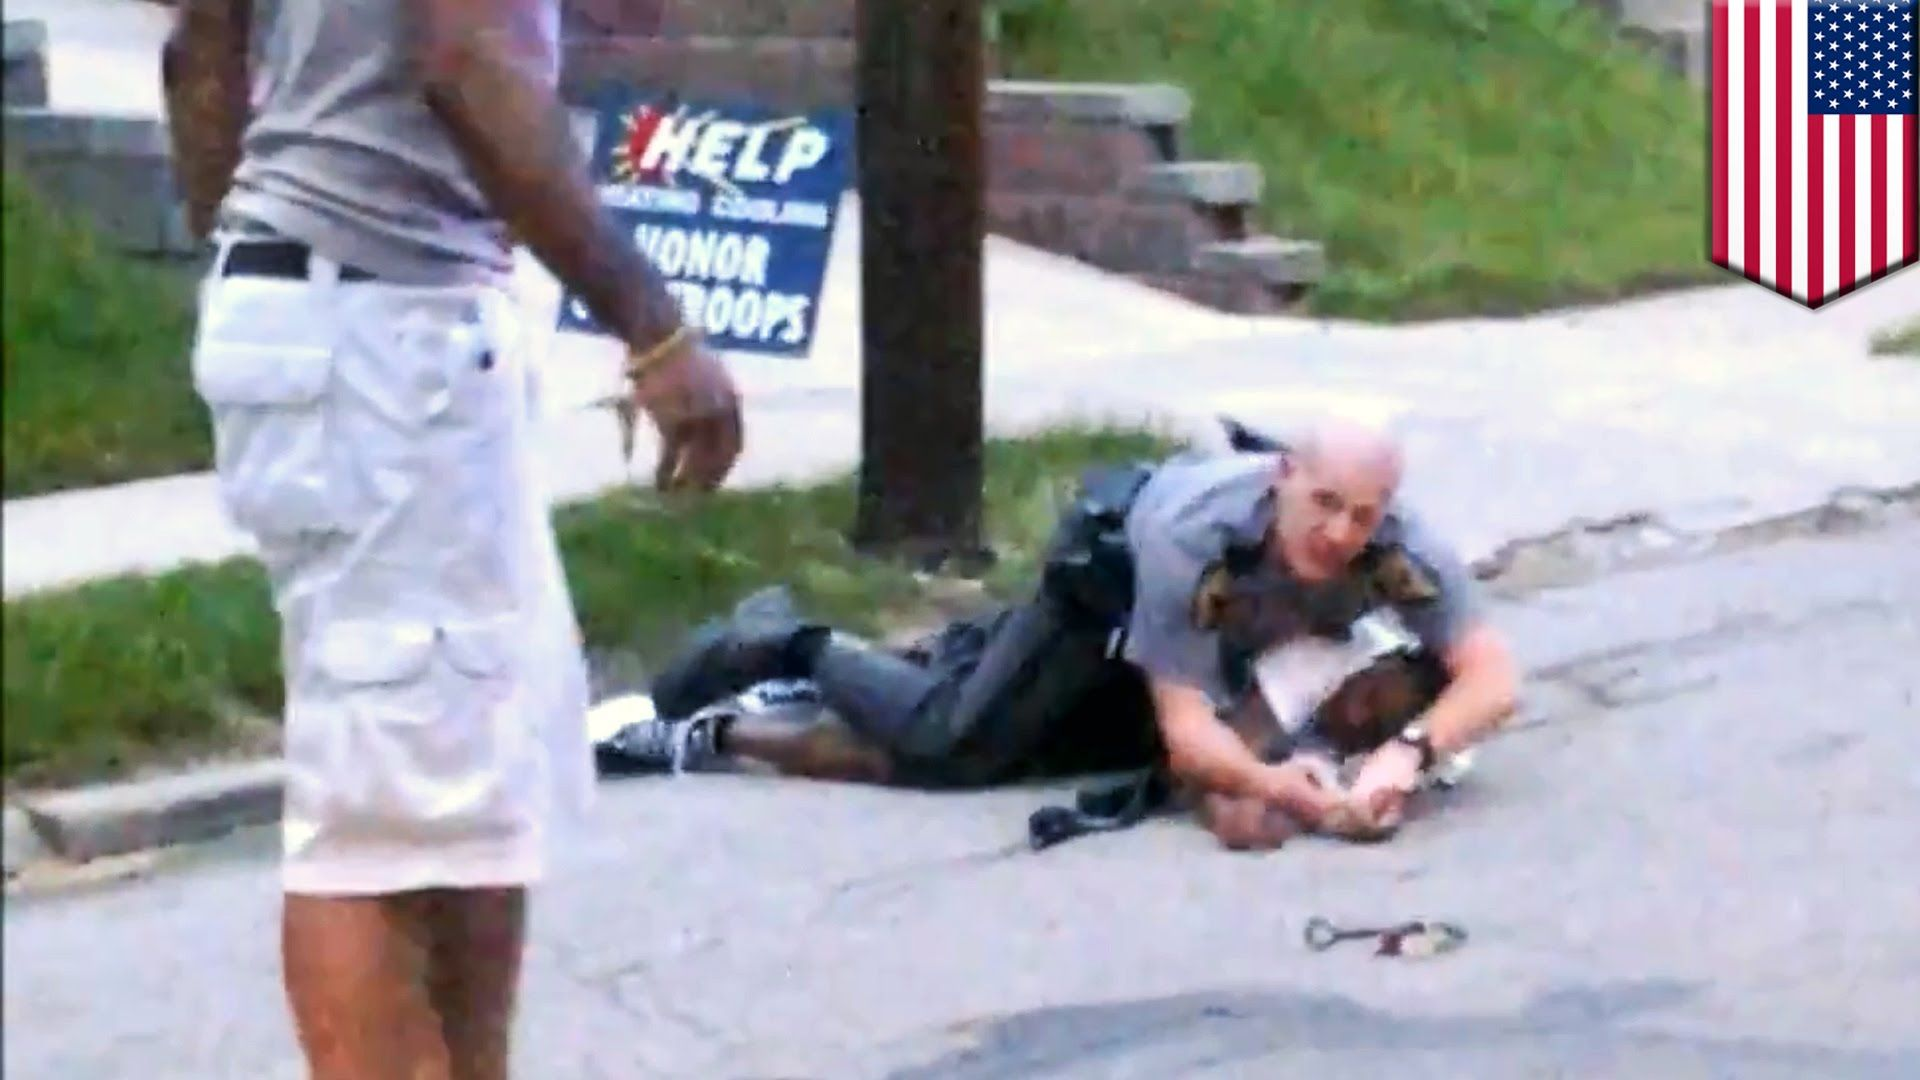 Civilian hero risks life to save cop fighting suspect